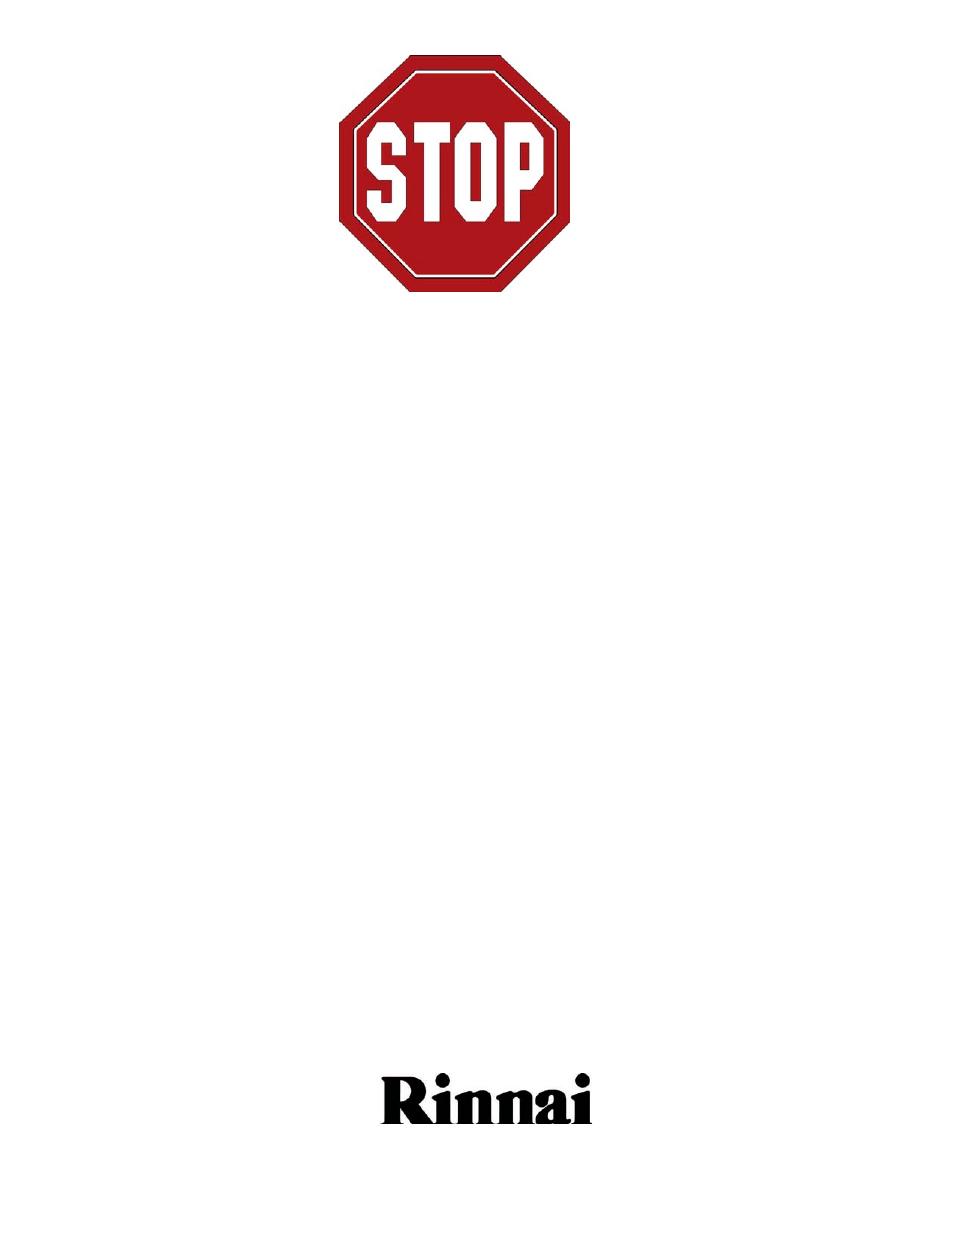 medium resolution of installer s instructions rinnai continuum 2424wc user manual page 19 48